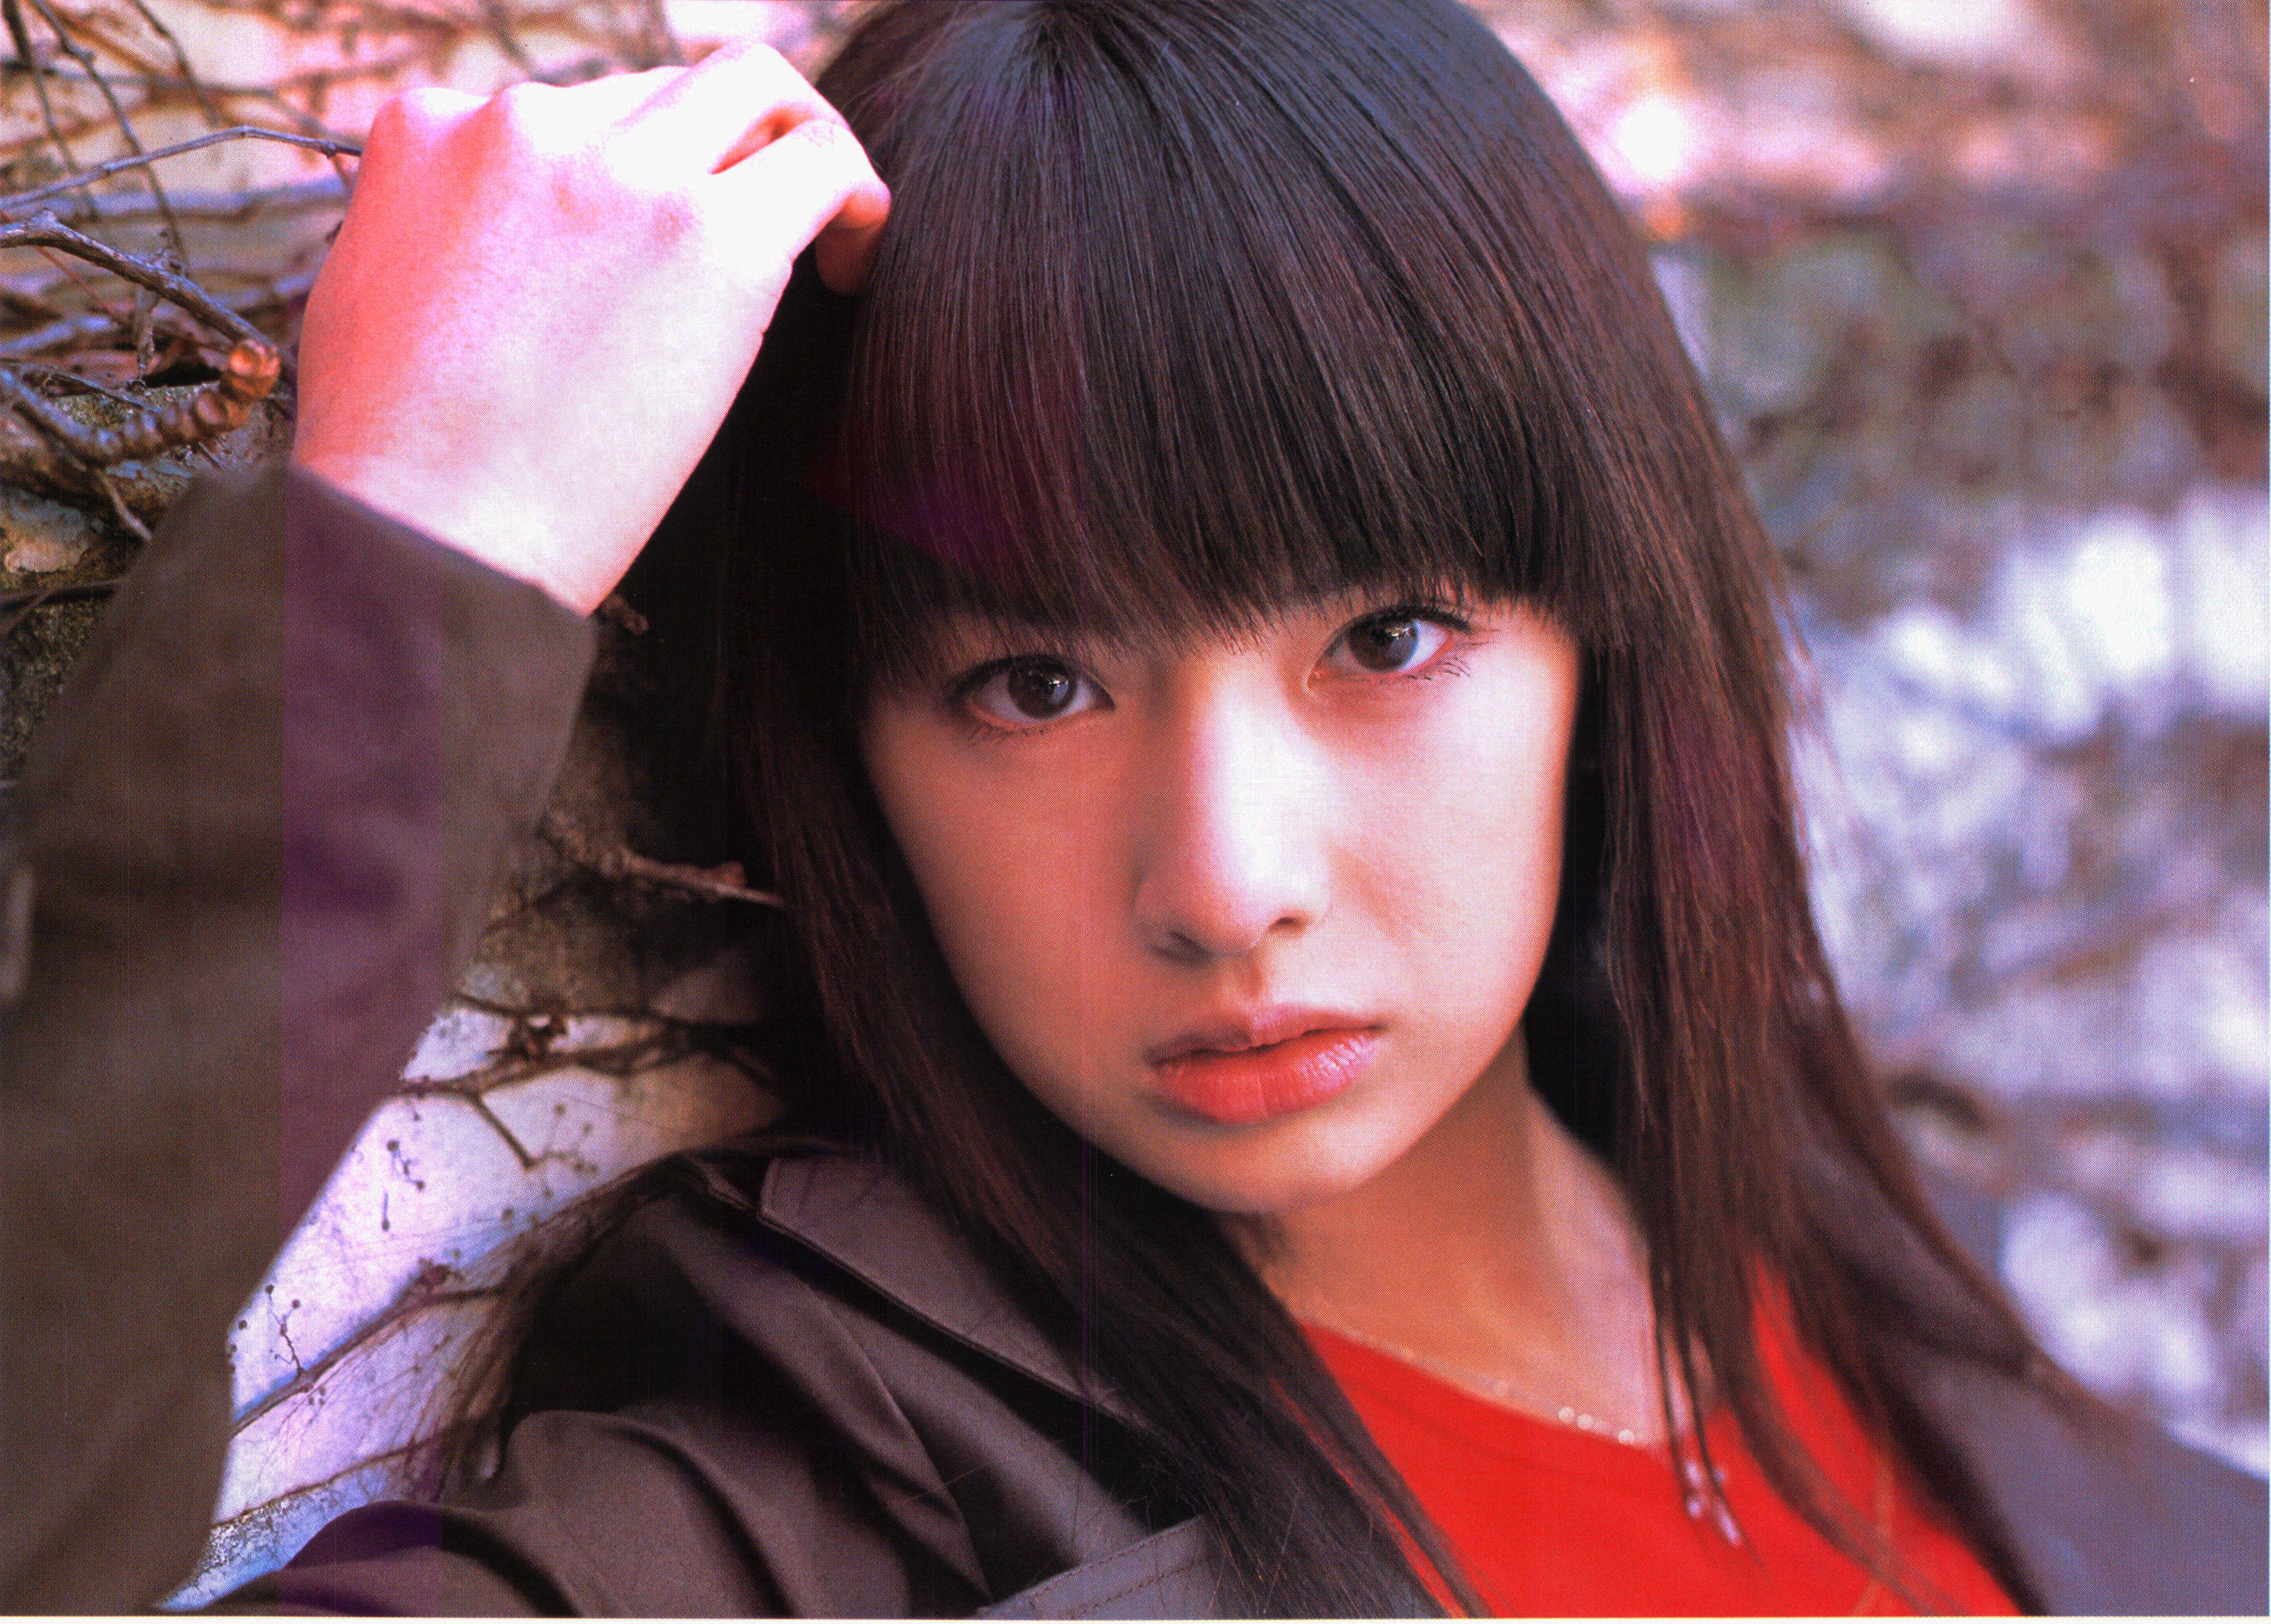 Watch Keiko Kitagawa video